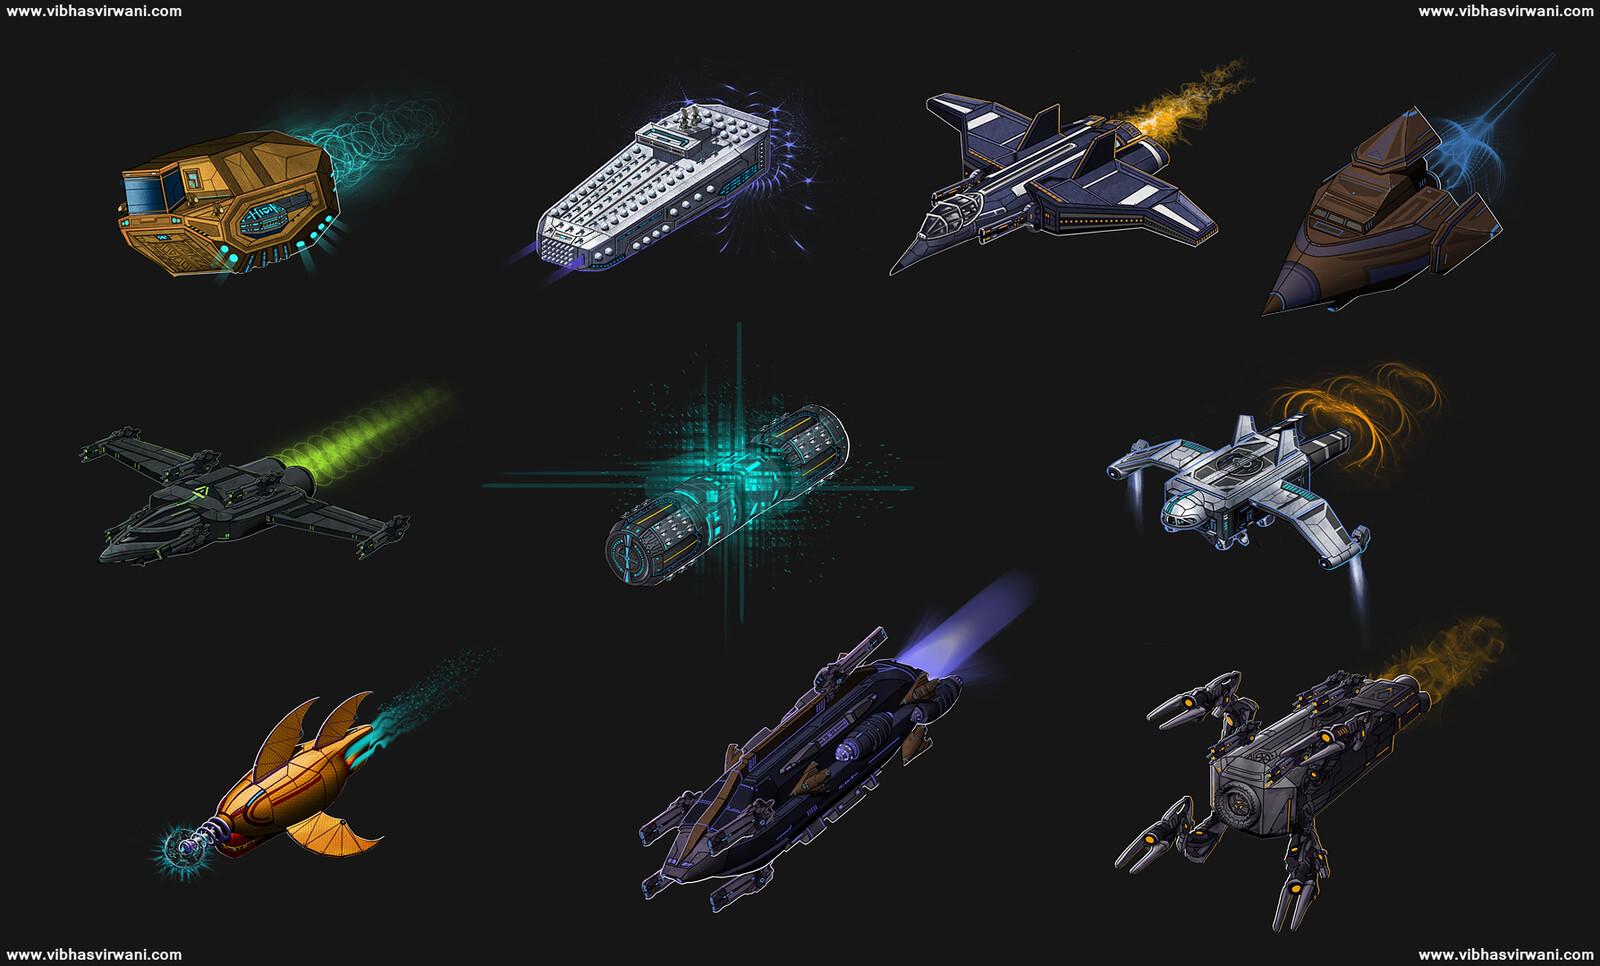 Spaceship concept art for Astounding futures Vol. 1